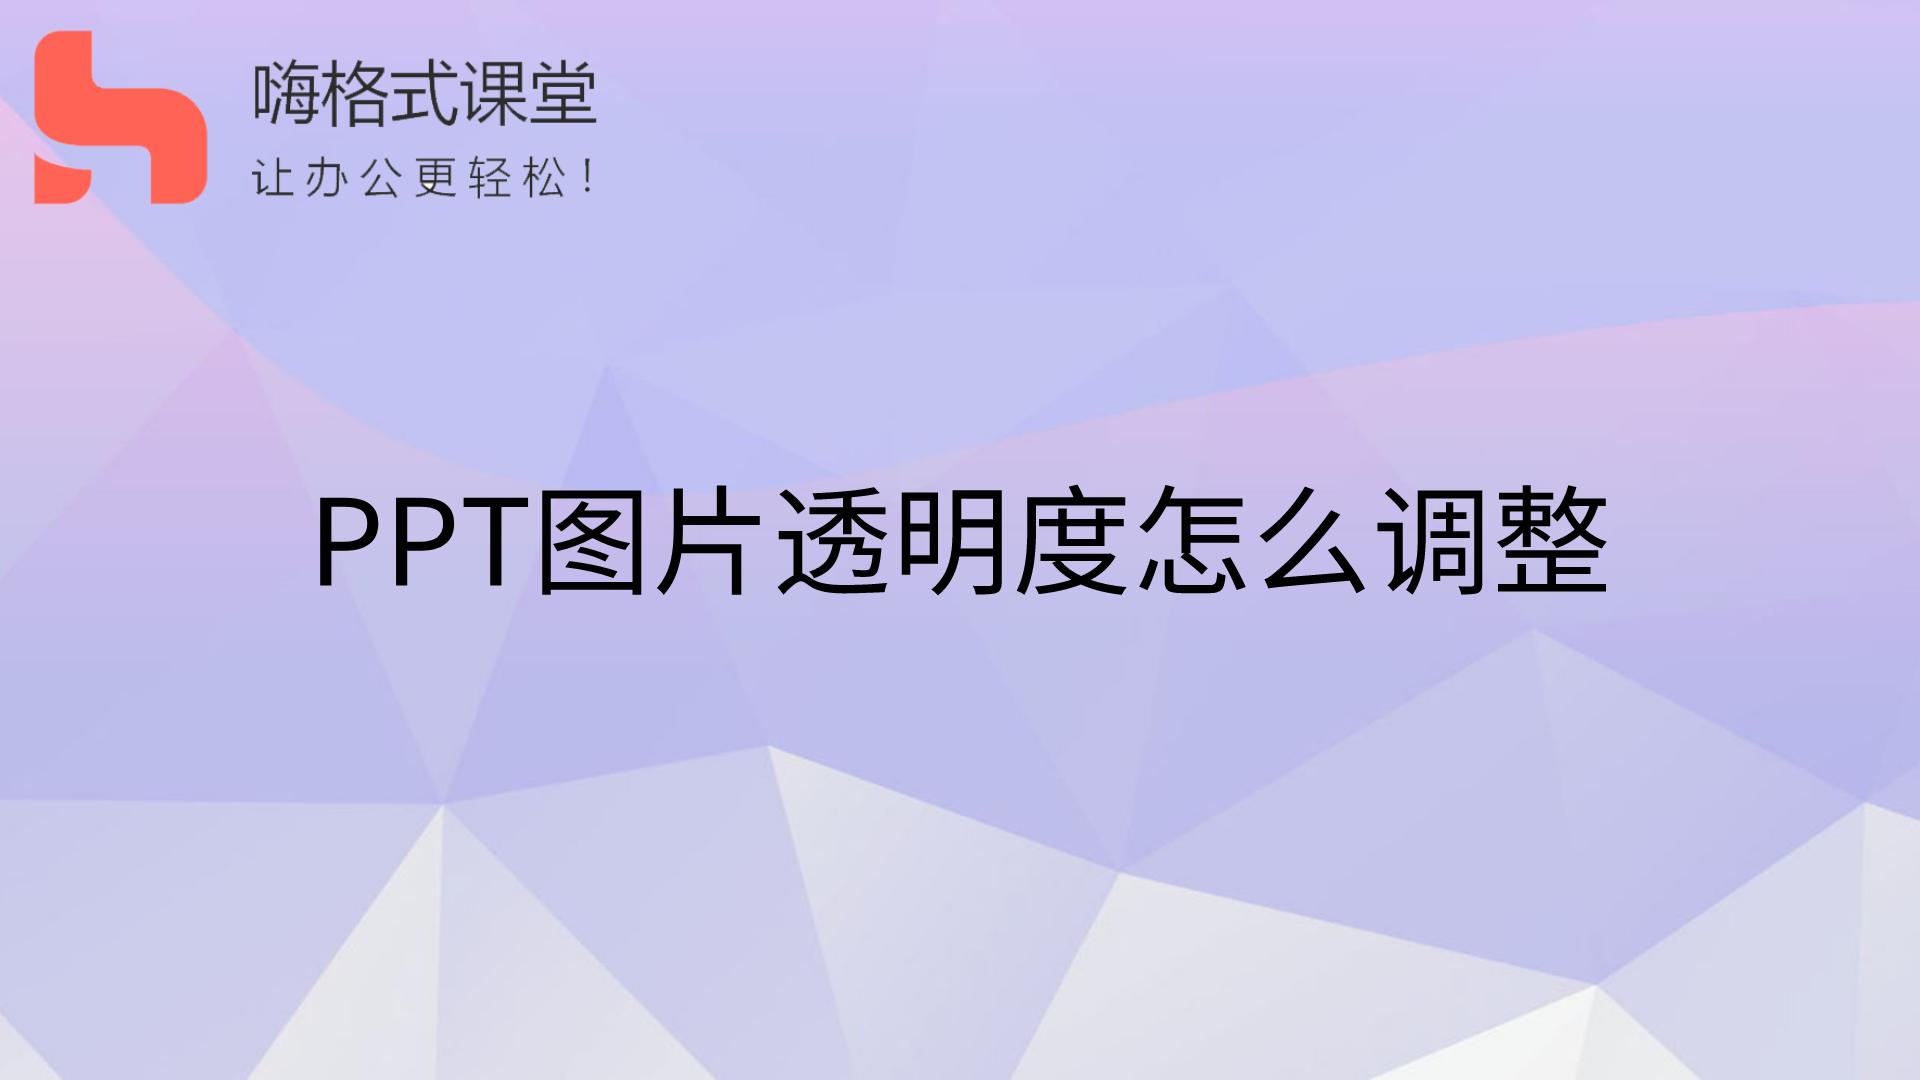 PPT图片透明度怎么调整s